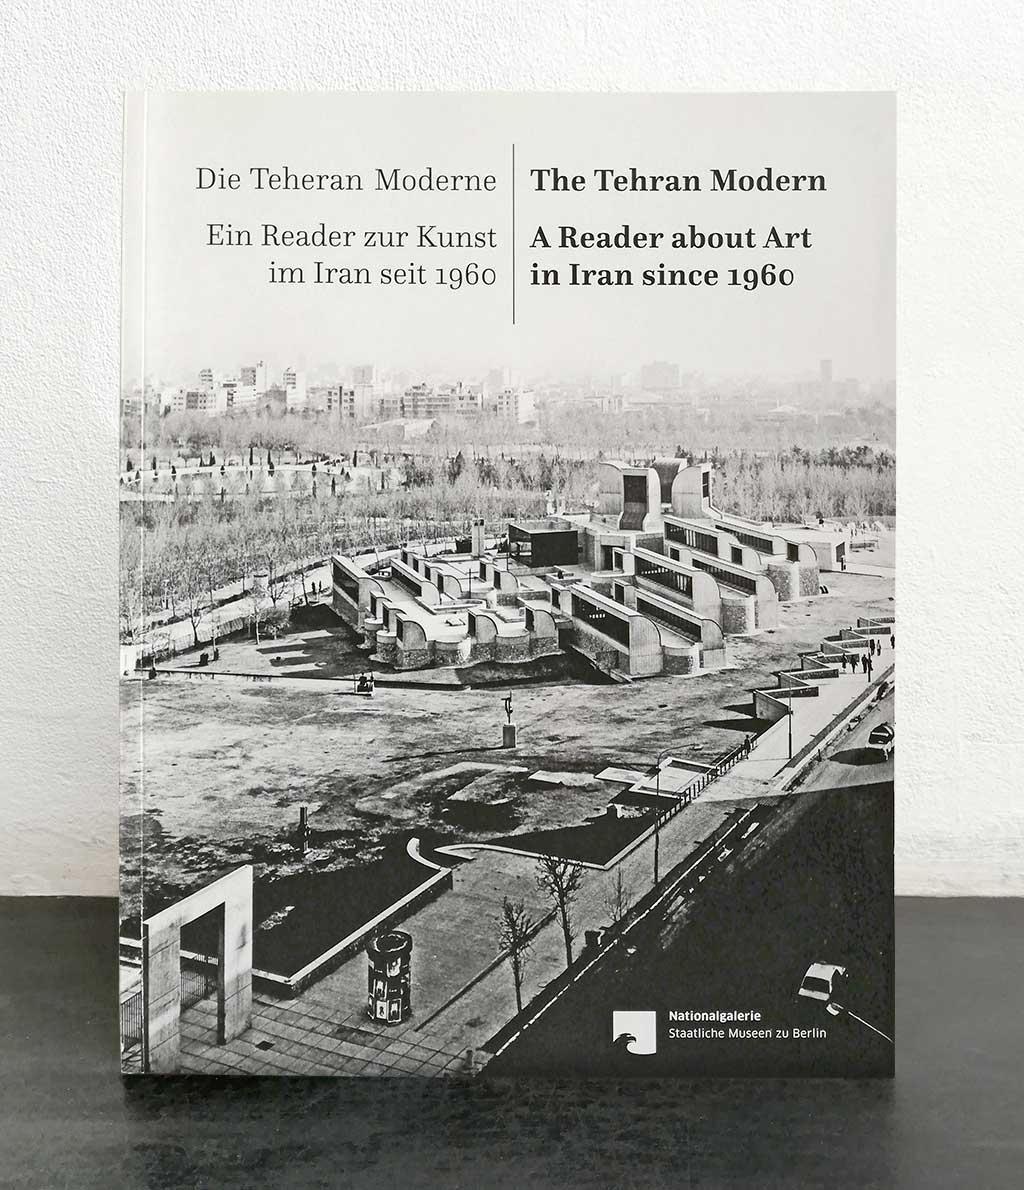 THE TEHRAN MODERN